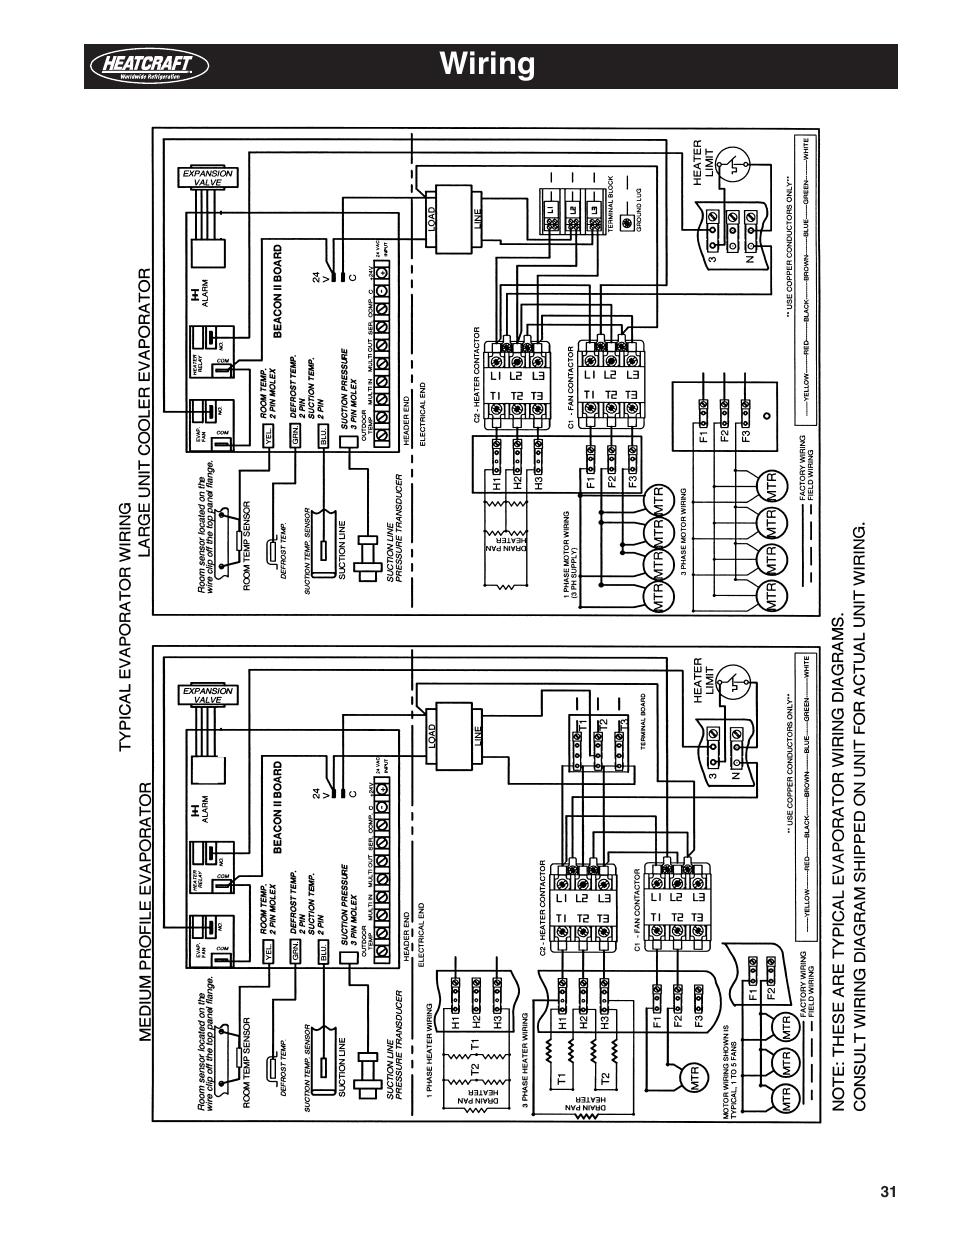 medium resolution of heatcraft refrigeration wiring diagrams